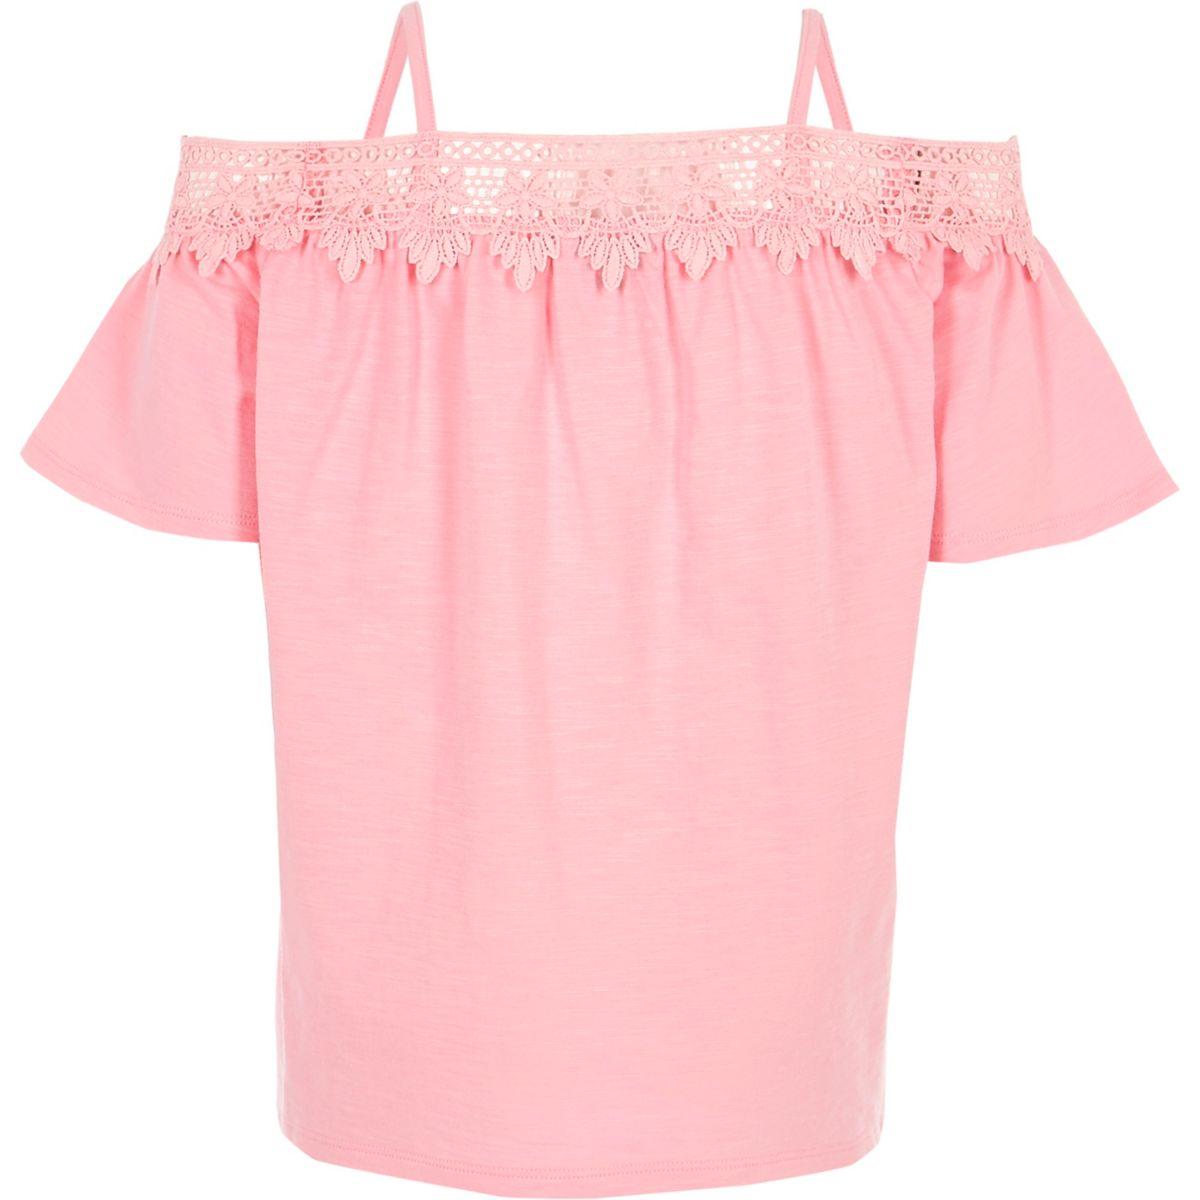 Girls pink crochet lace bardot top